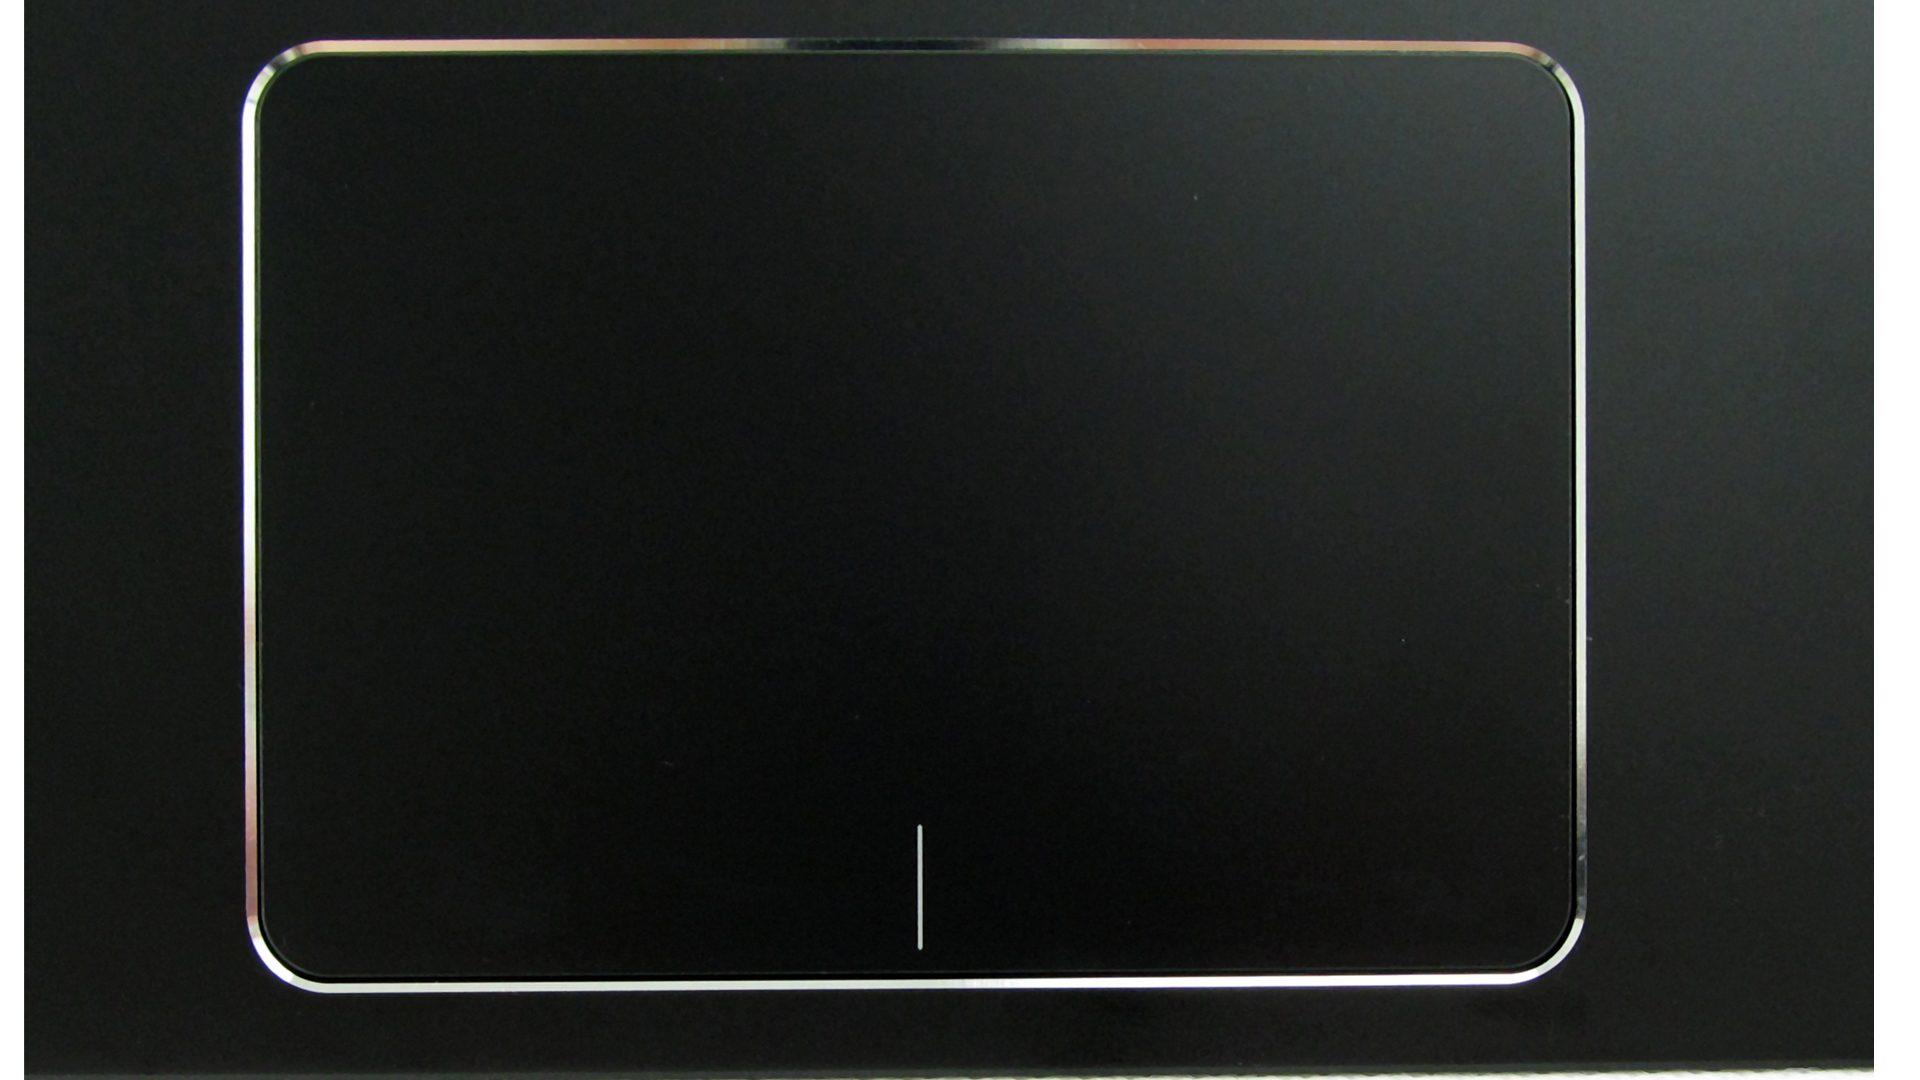 Asus-UX360UAK-BB284T-Zenbook—Tastatur-2